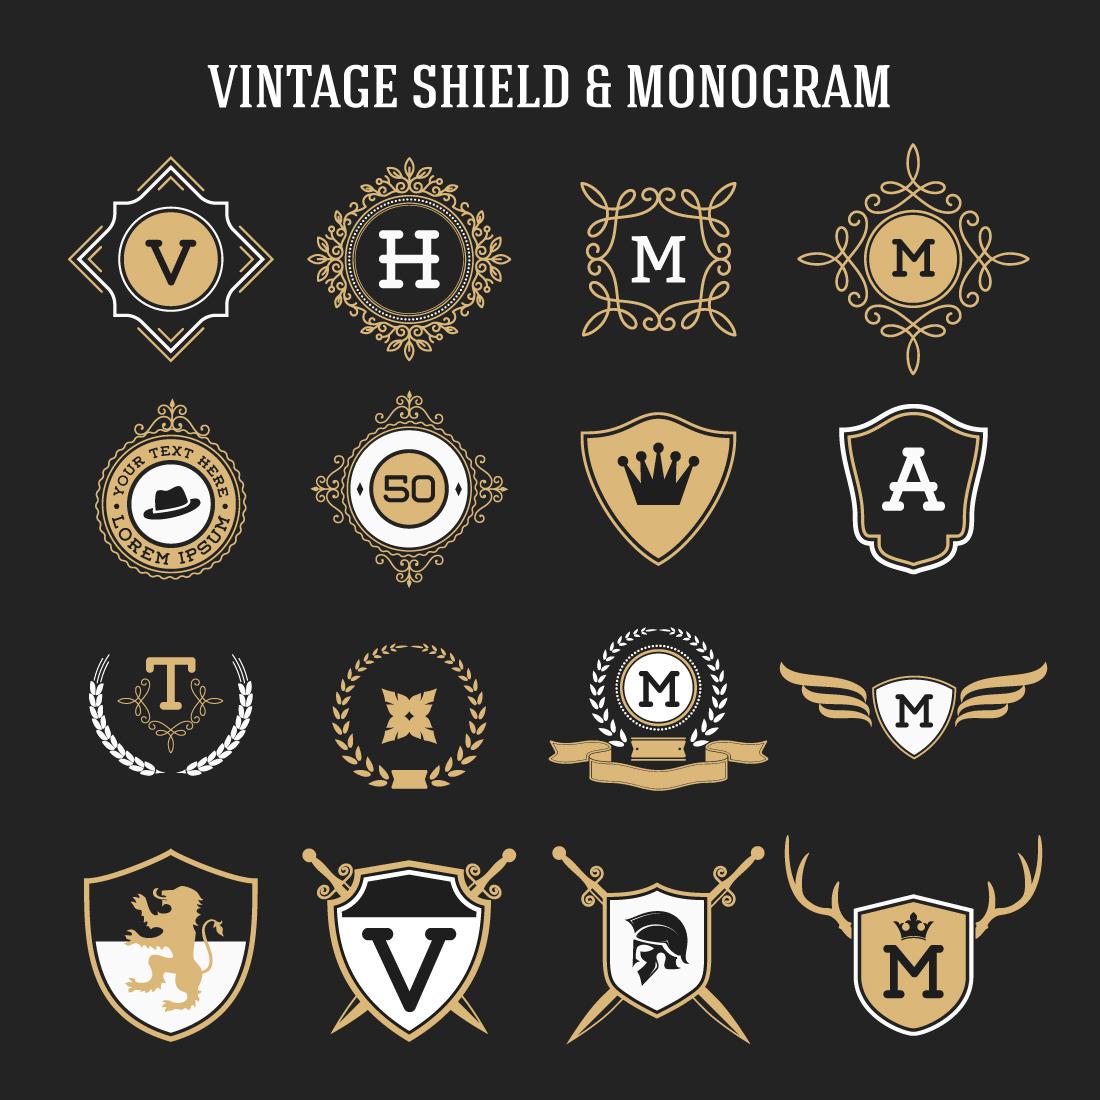 Vintage Ribbon Banners: Set Of Vintage Monogram And Shield Elements